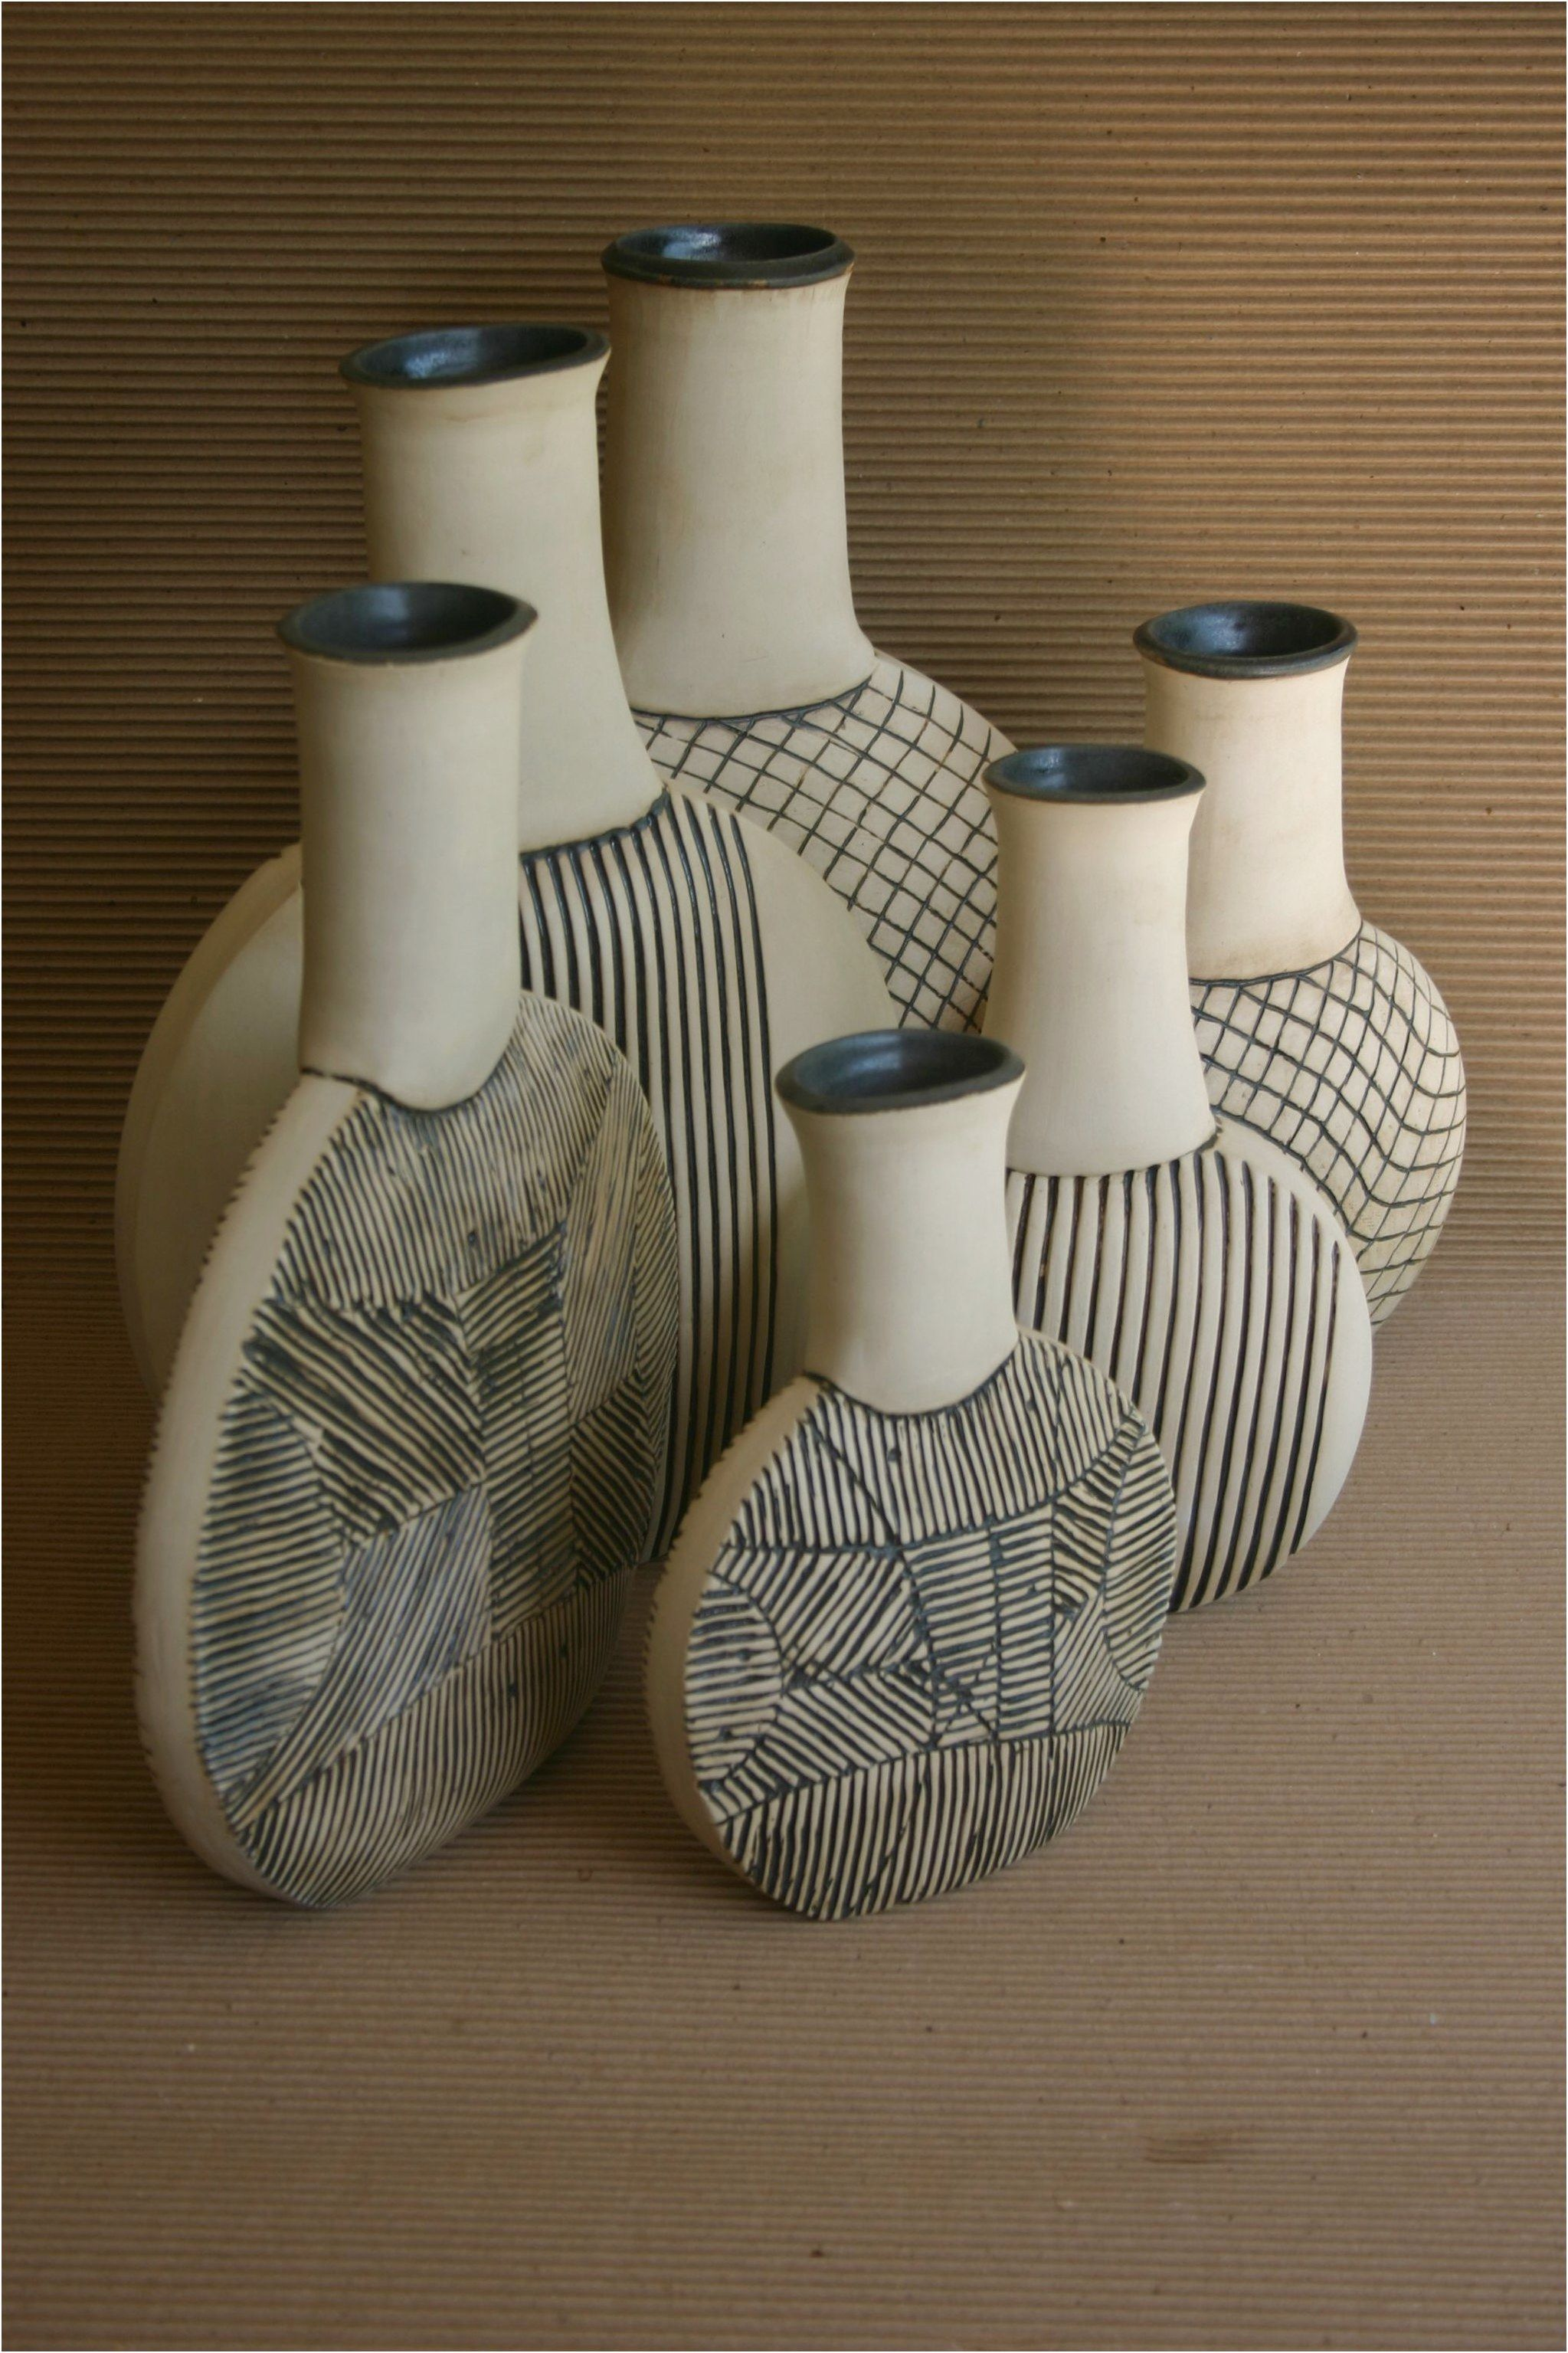 Botellas 2006 Gres Blanco Y Esmalte Obsidiana 30 X 30 X 40 Cmts Potteryinspirations Pottery Ceramics Click For More Pottery Bottles Ceramic Pottery Pottery